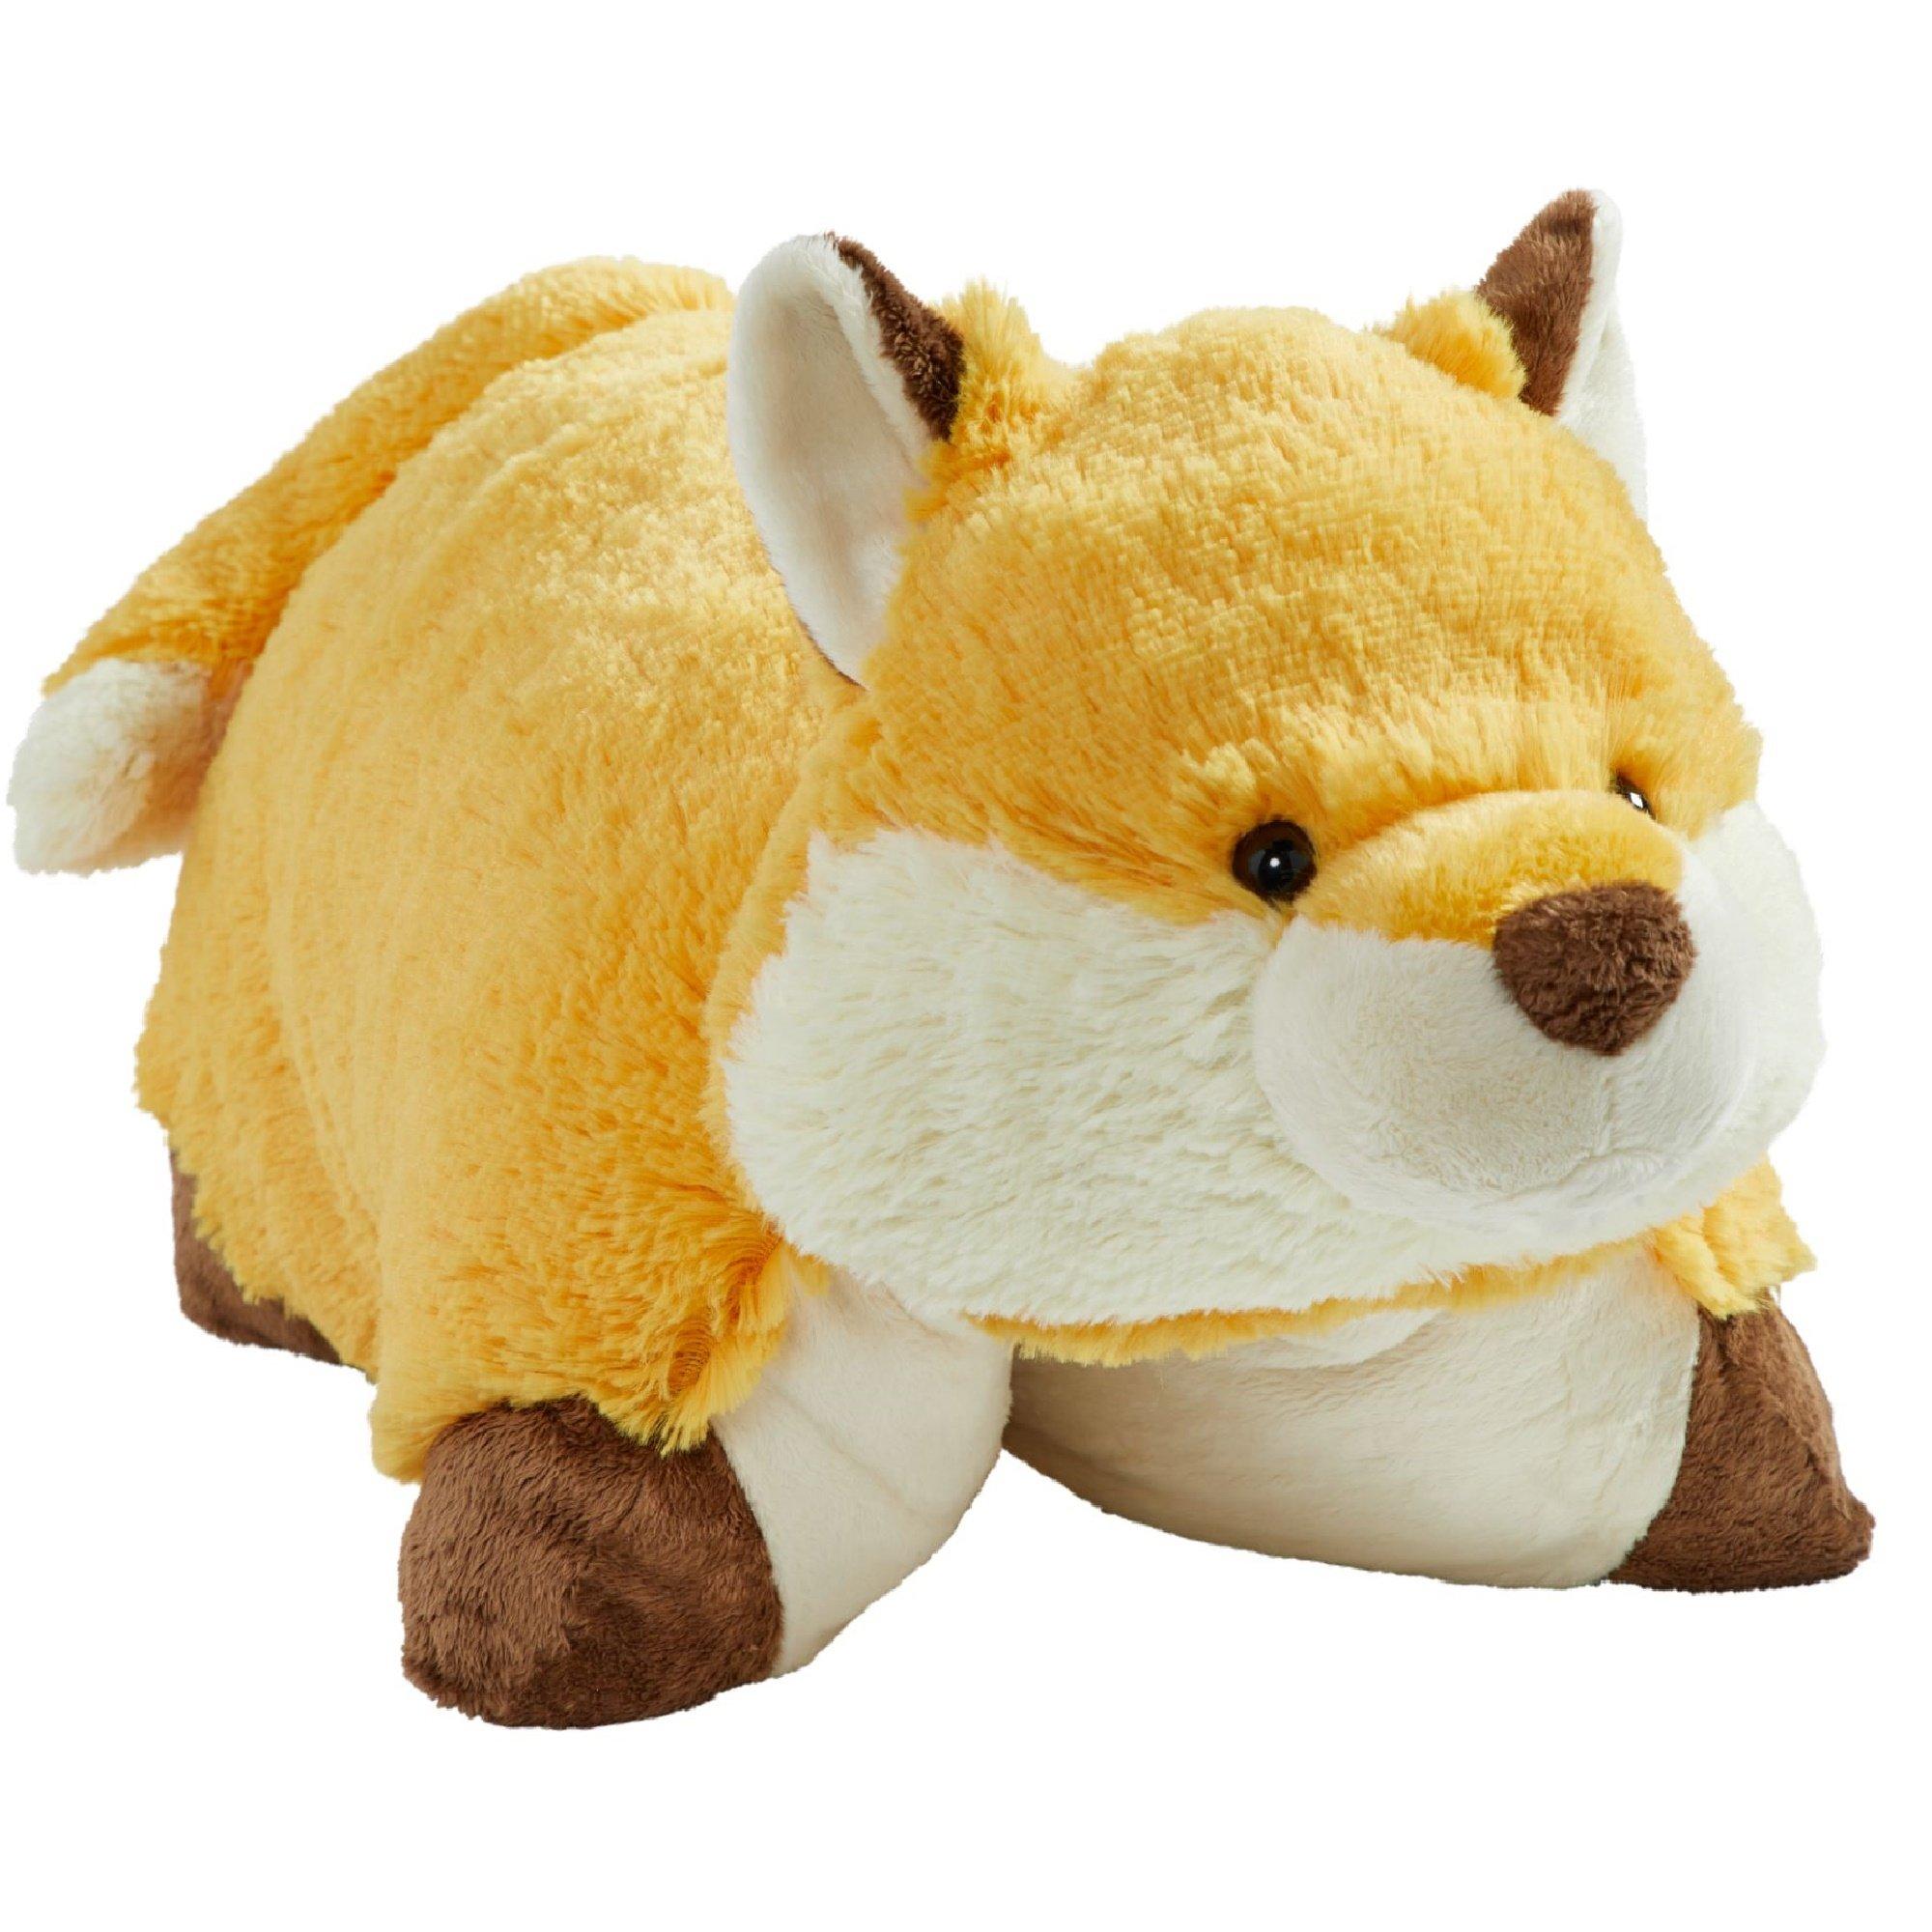 Pillow Pets Original, Wild Fox, 18'' Stuffed Animal Plush Toy